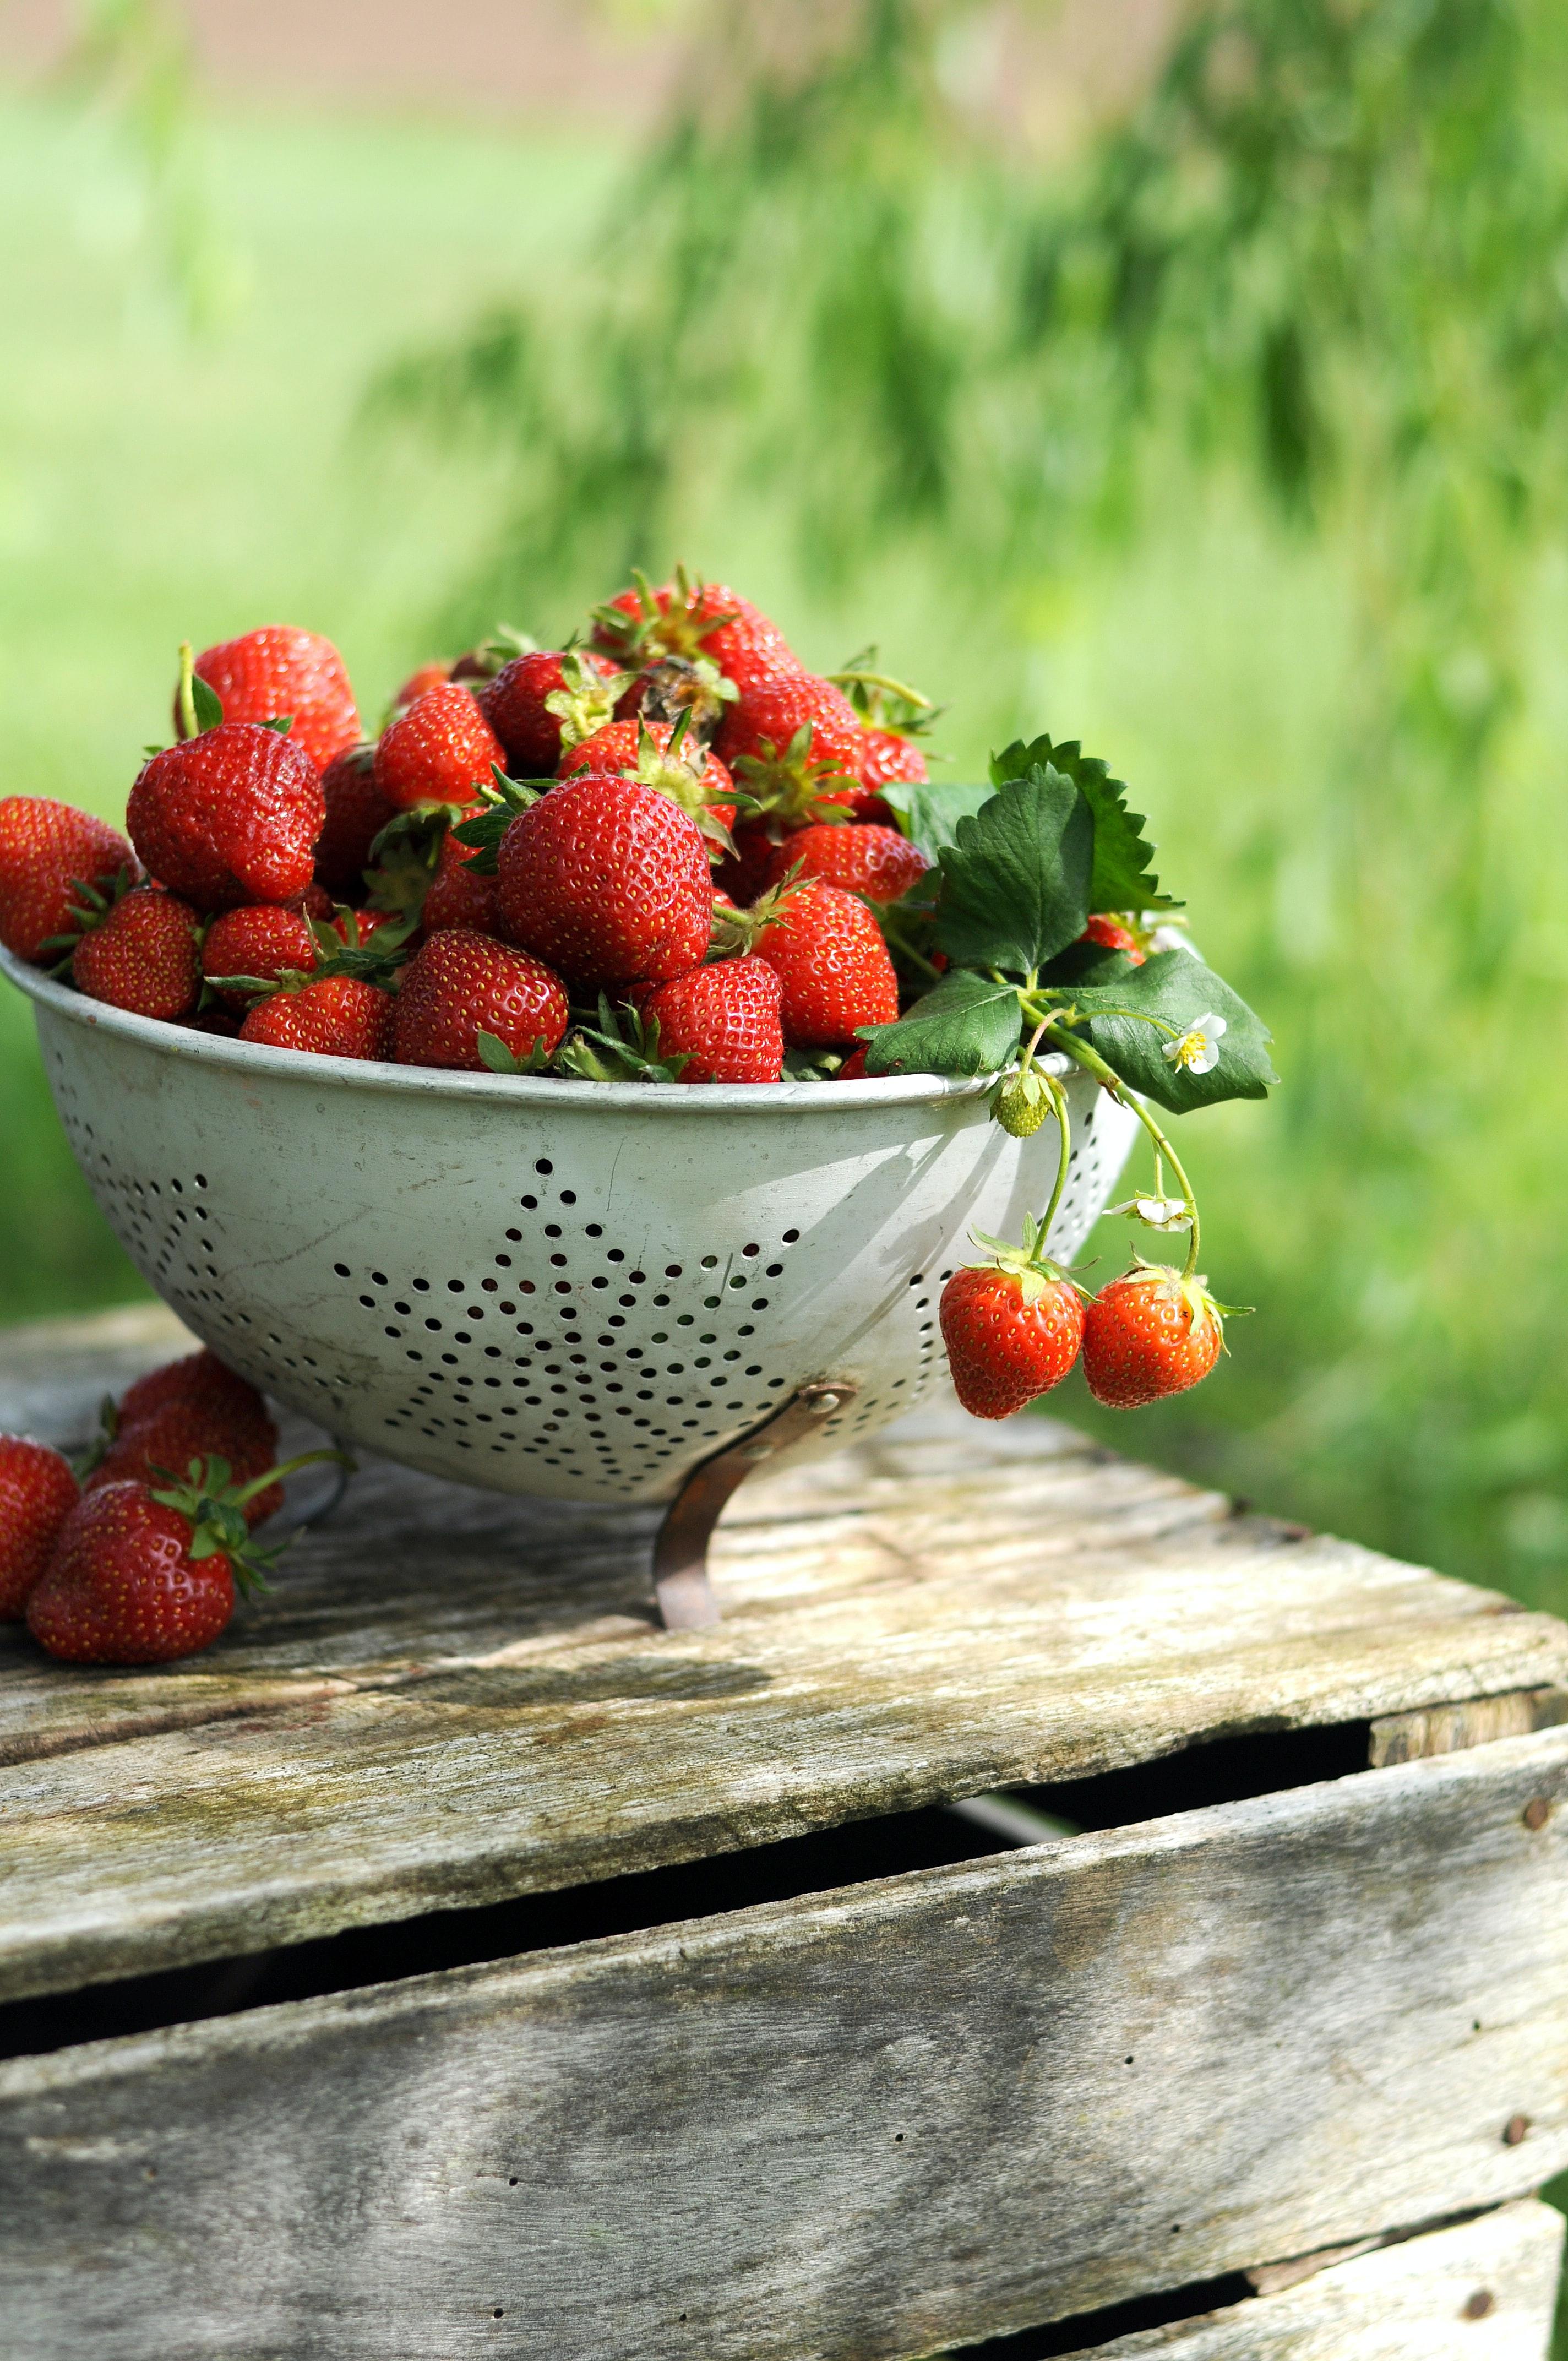 Fruit - Strawberry 400g